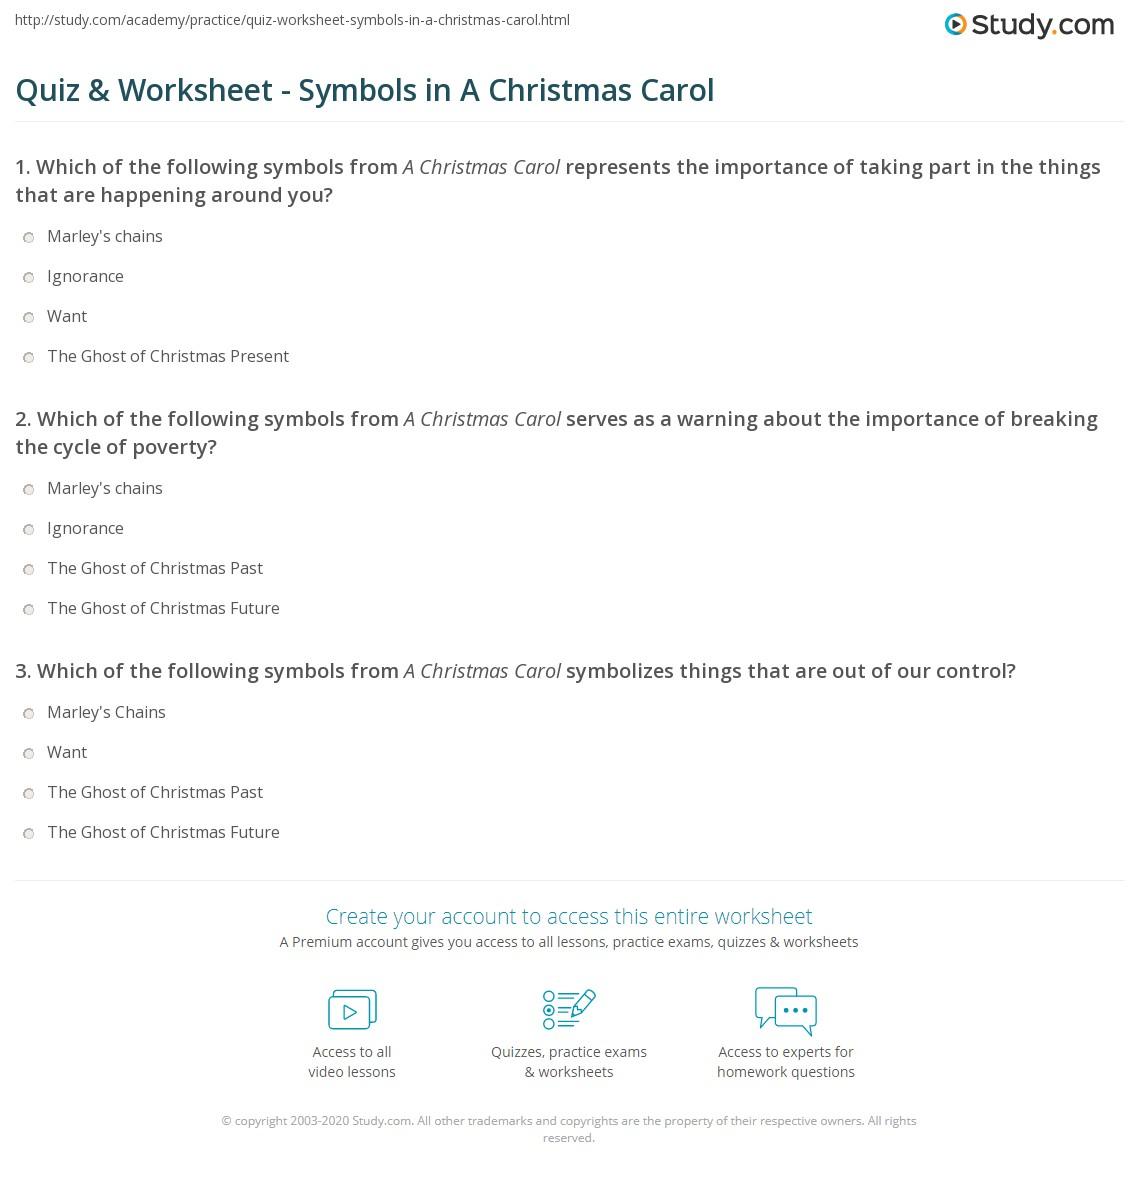 Quiz & Worksheet - Symbols In A Christmas Carol   Study